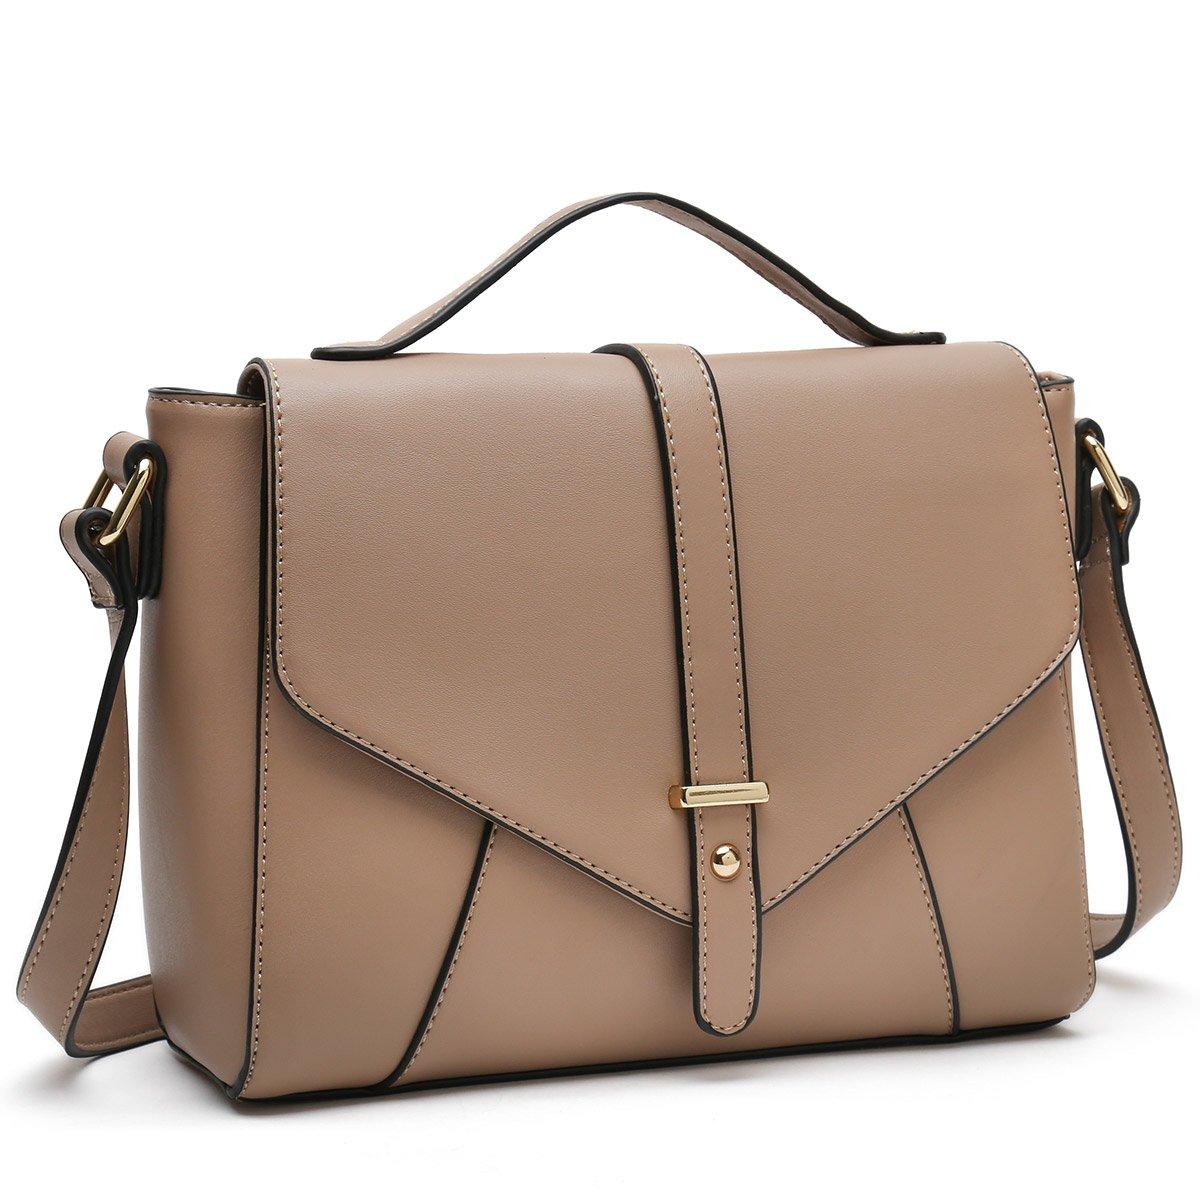 61128b27c Medium Sized Crossbody Purses Ladies Designer Shoulder Bags for Women  Handbags (Apricot): Handbags: Amazon.com